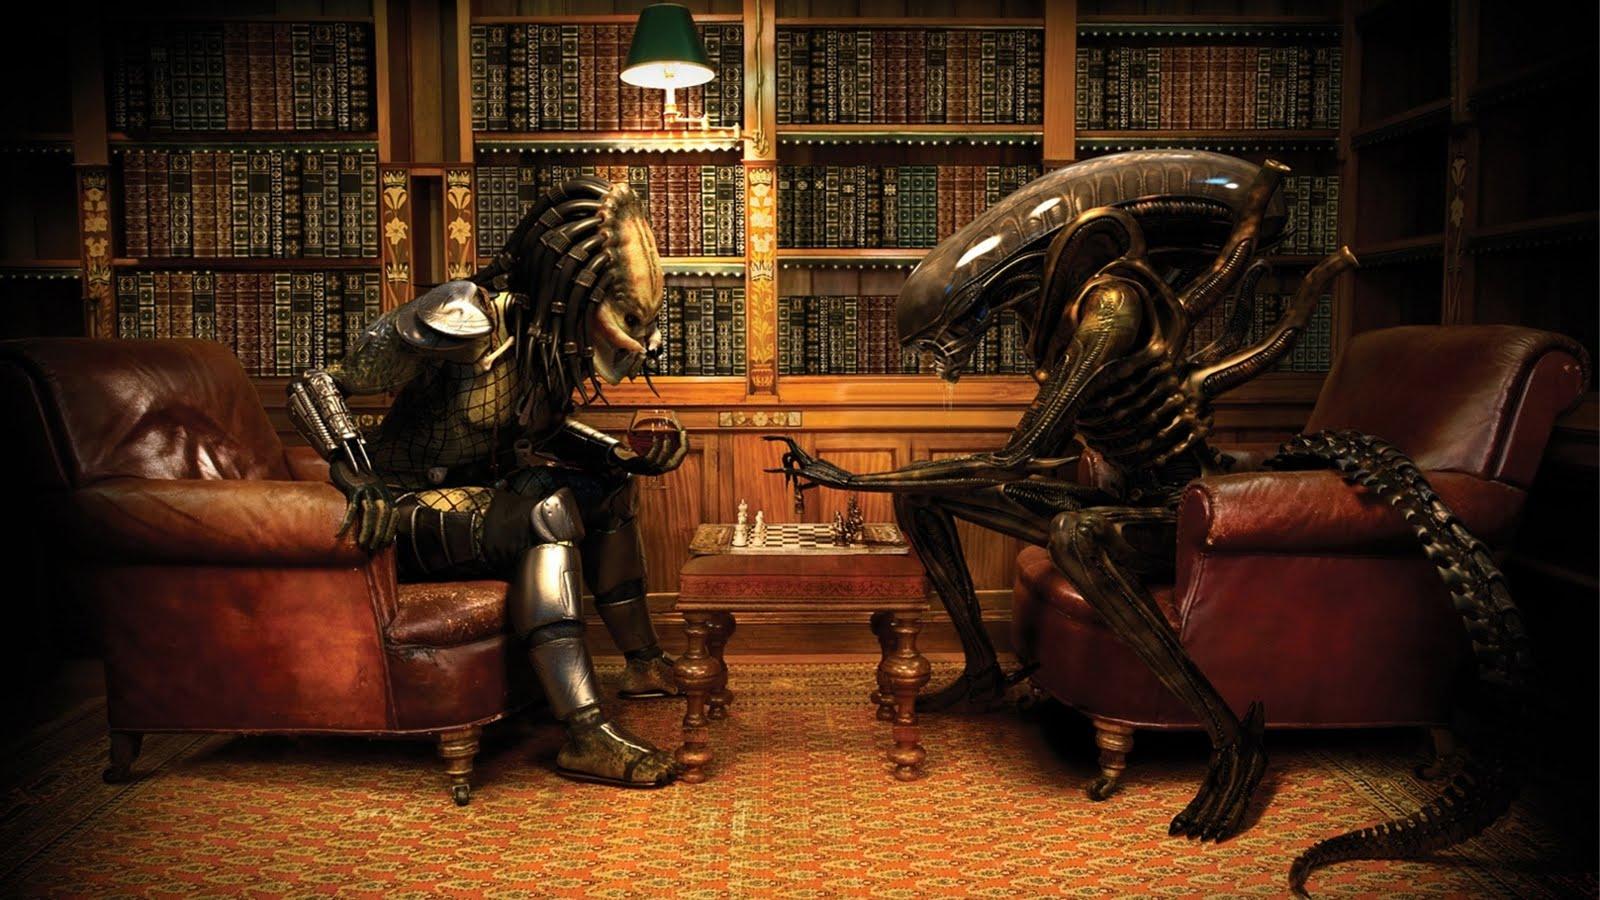 http://4.bp.blogspot.com/-TZoU3qttT4g/TscTWX7N0KI/AAAAAAAAAn8/UaA_VJfah0I/s1600/predators-wallpaper-hd-5-765309.jpg